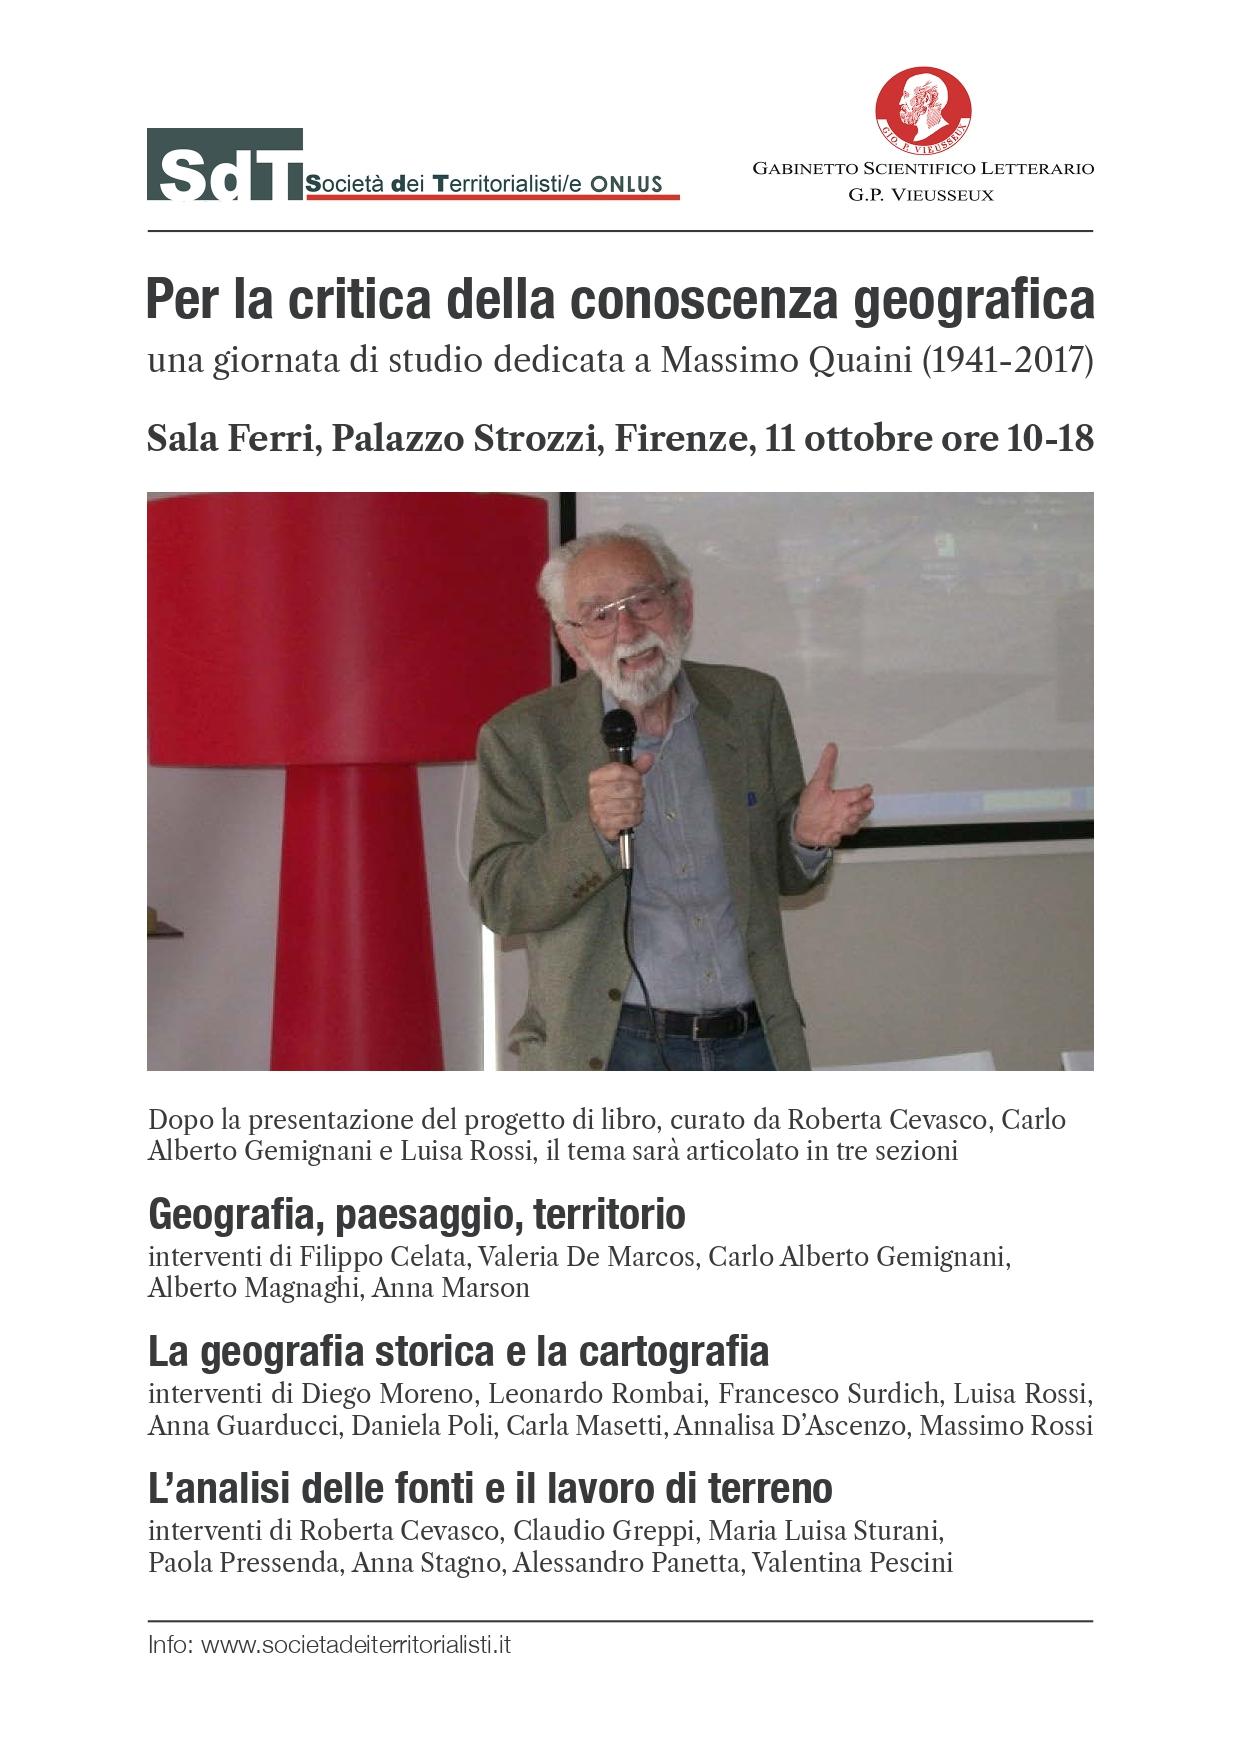 PerLaCriticaDellaConoscenzaGeografica2019_page-0001